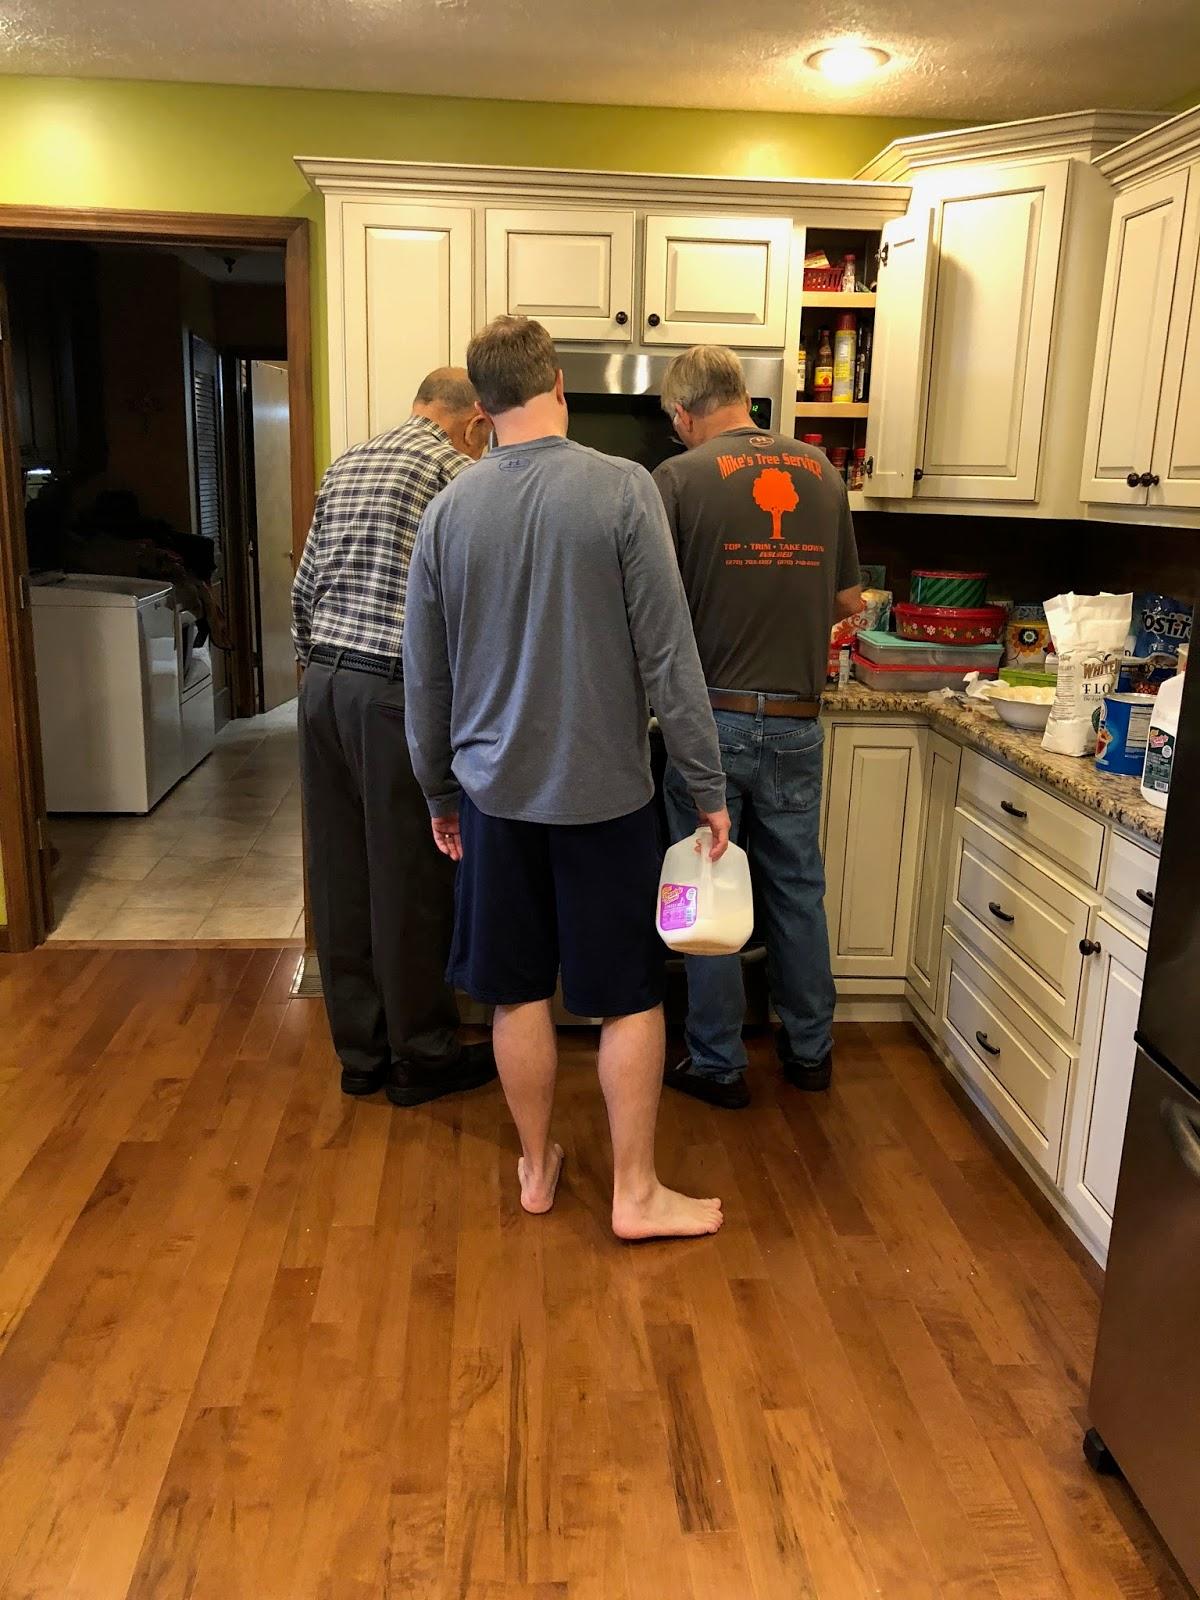 Growing Family Robinson: Christmas Morning in Kentucky